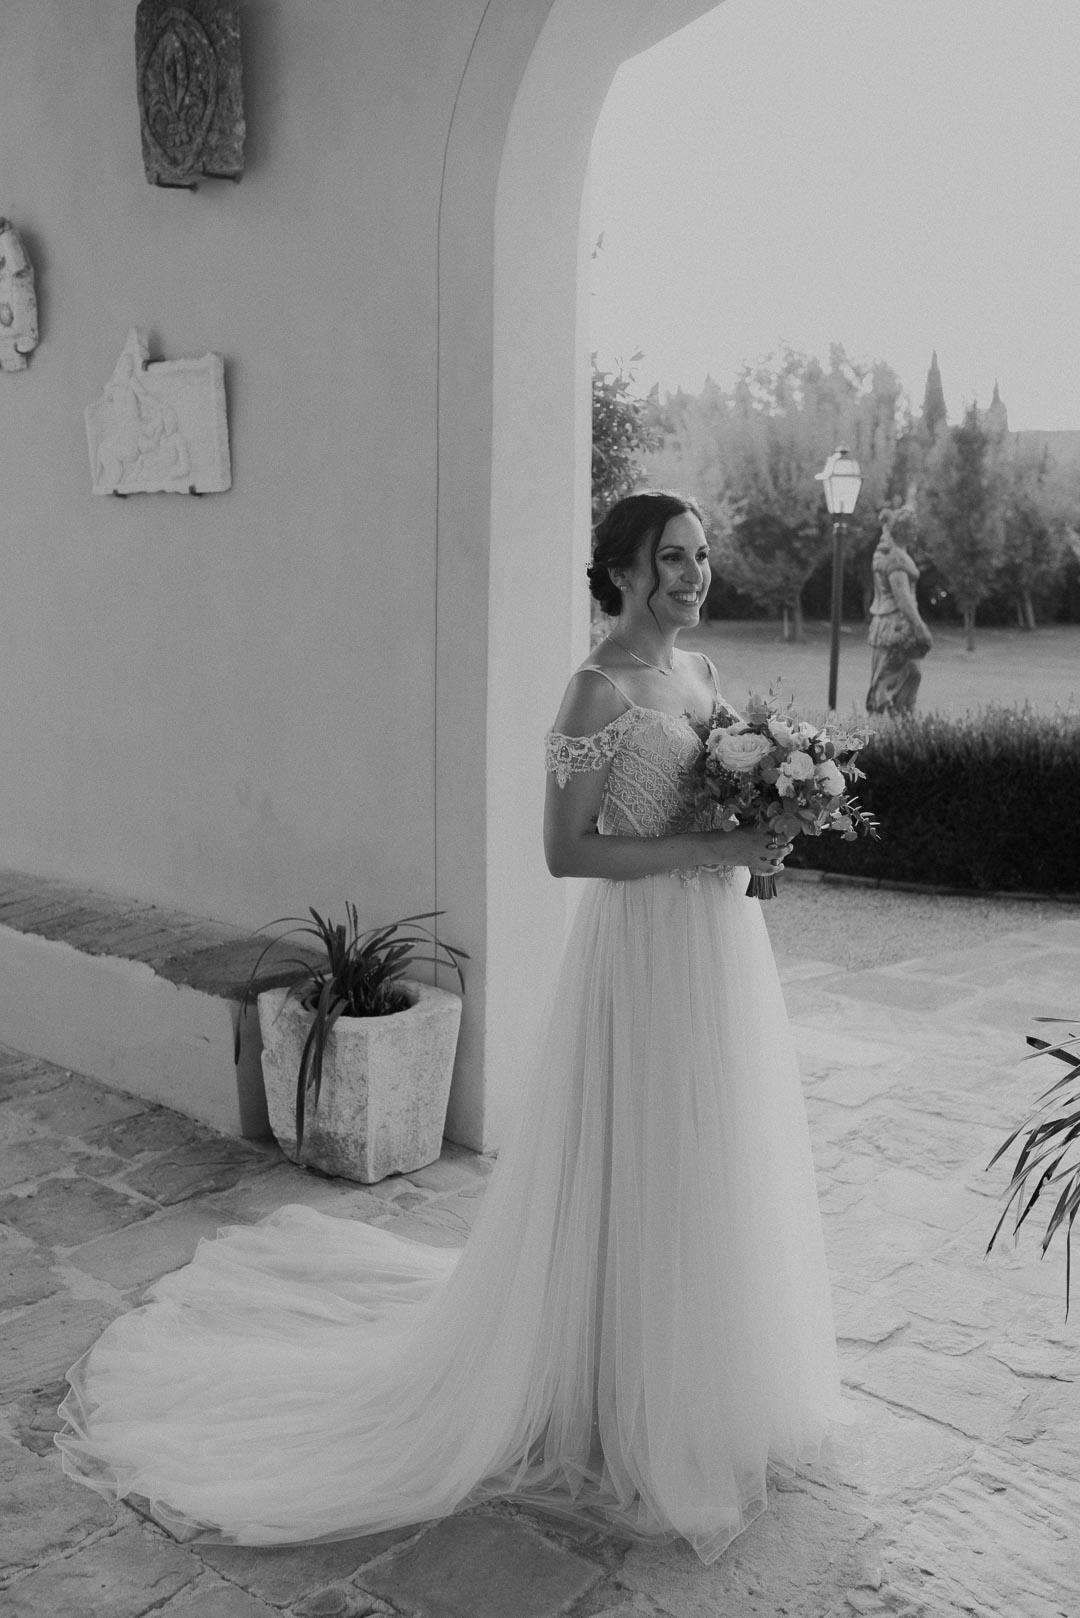 wedding-photographer-destination-fineart-bespoke-reportage-tuscany-villascorzi-vivianeizzo-spazio46-102